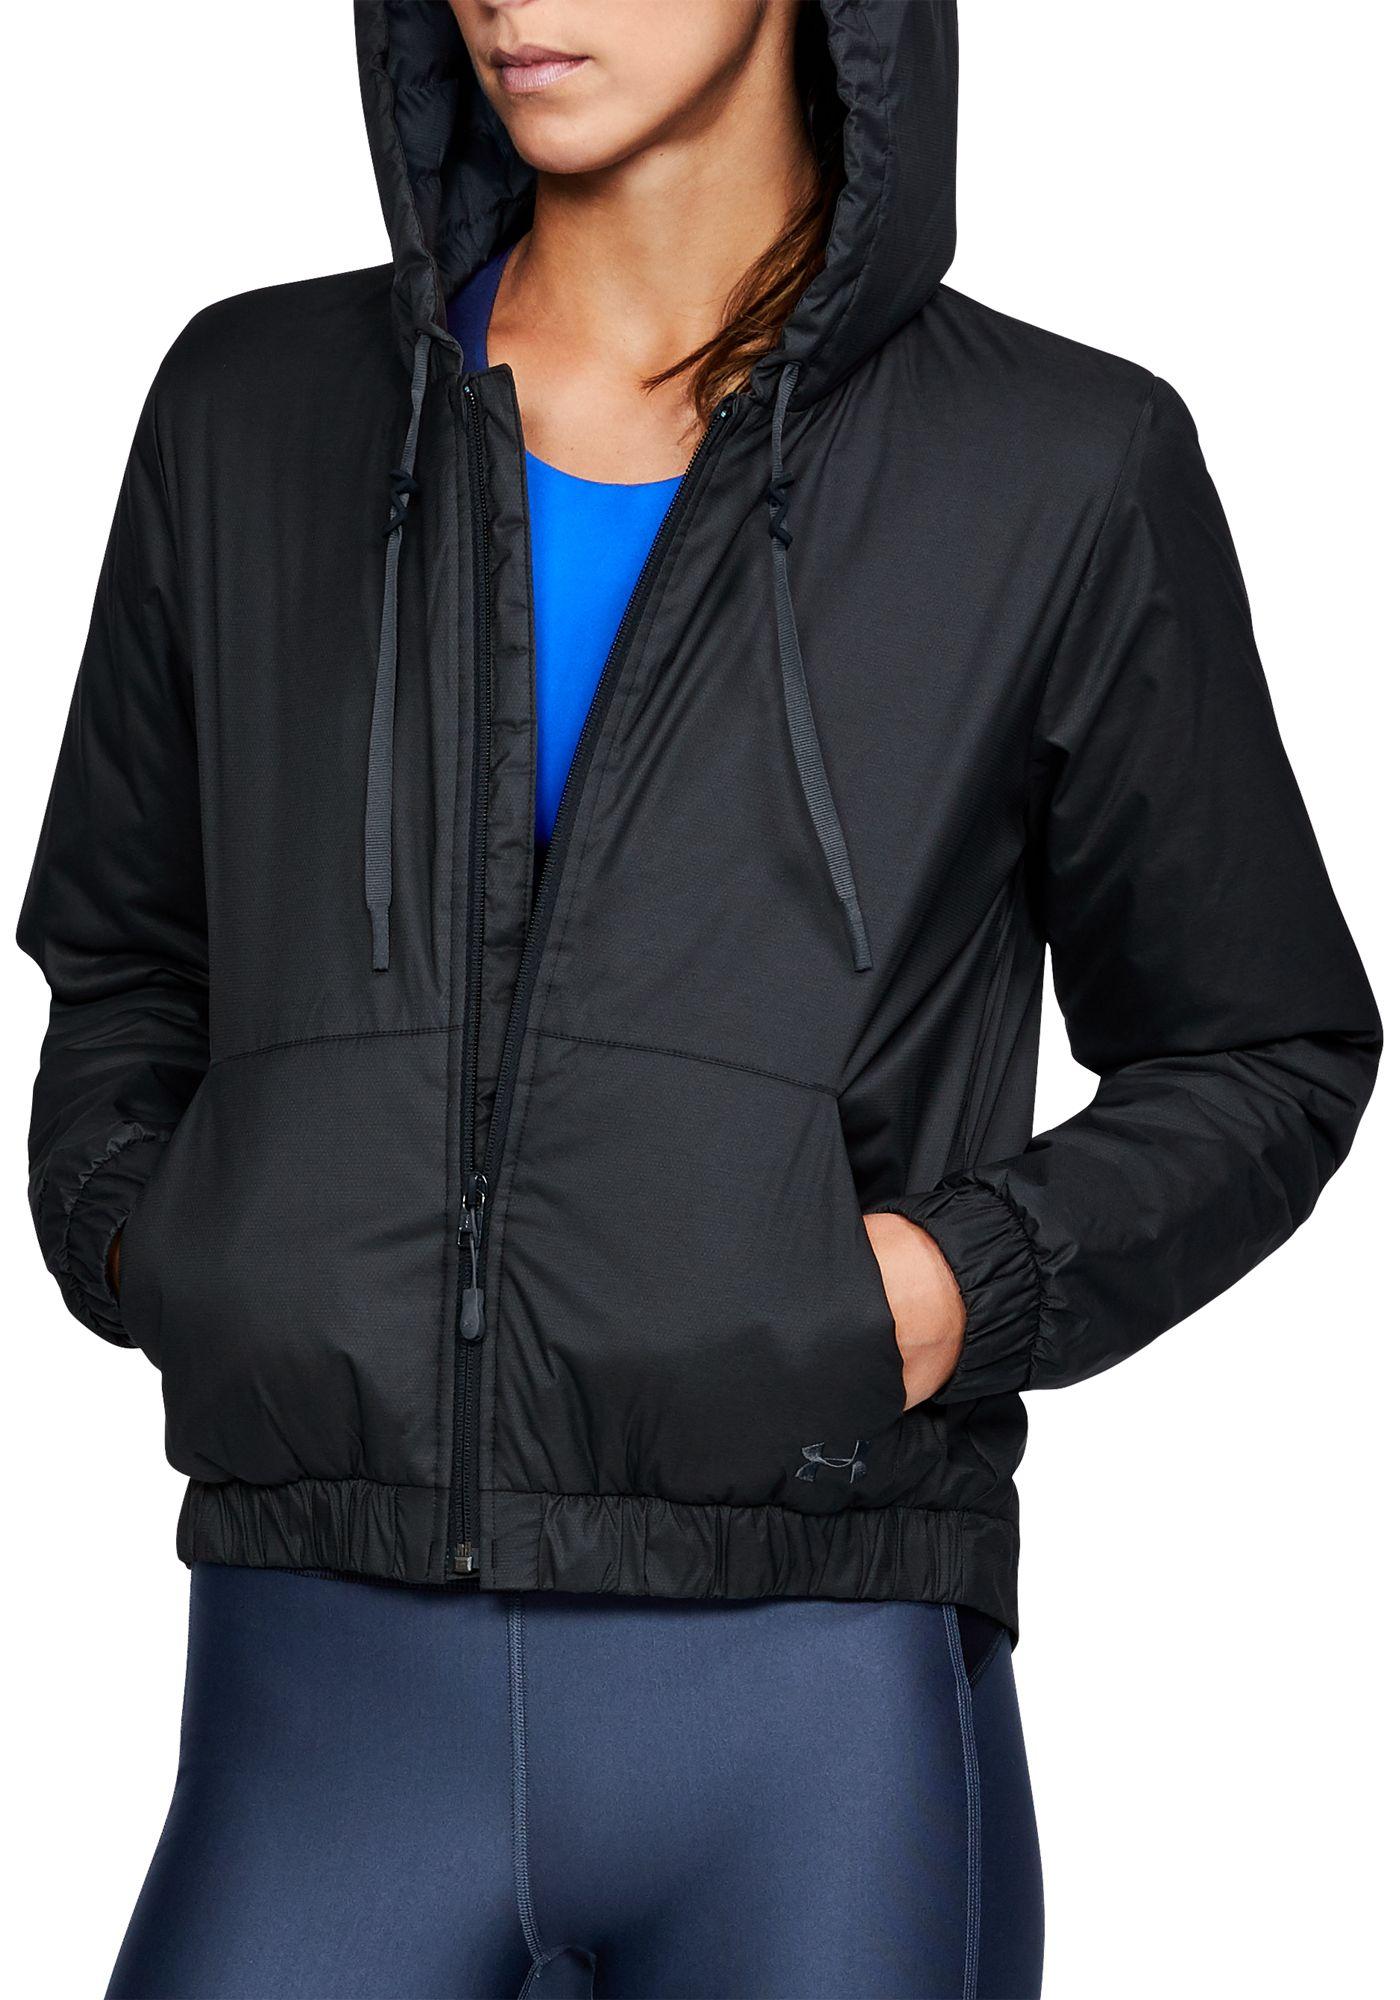 Under Armour Women's ColdGear Reactor Cropped Jacket